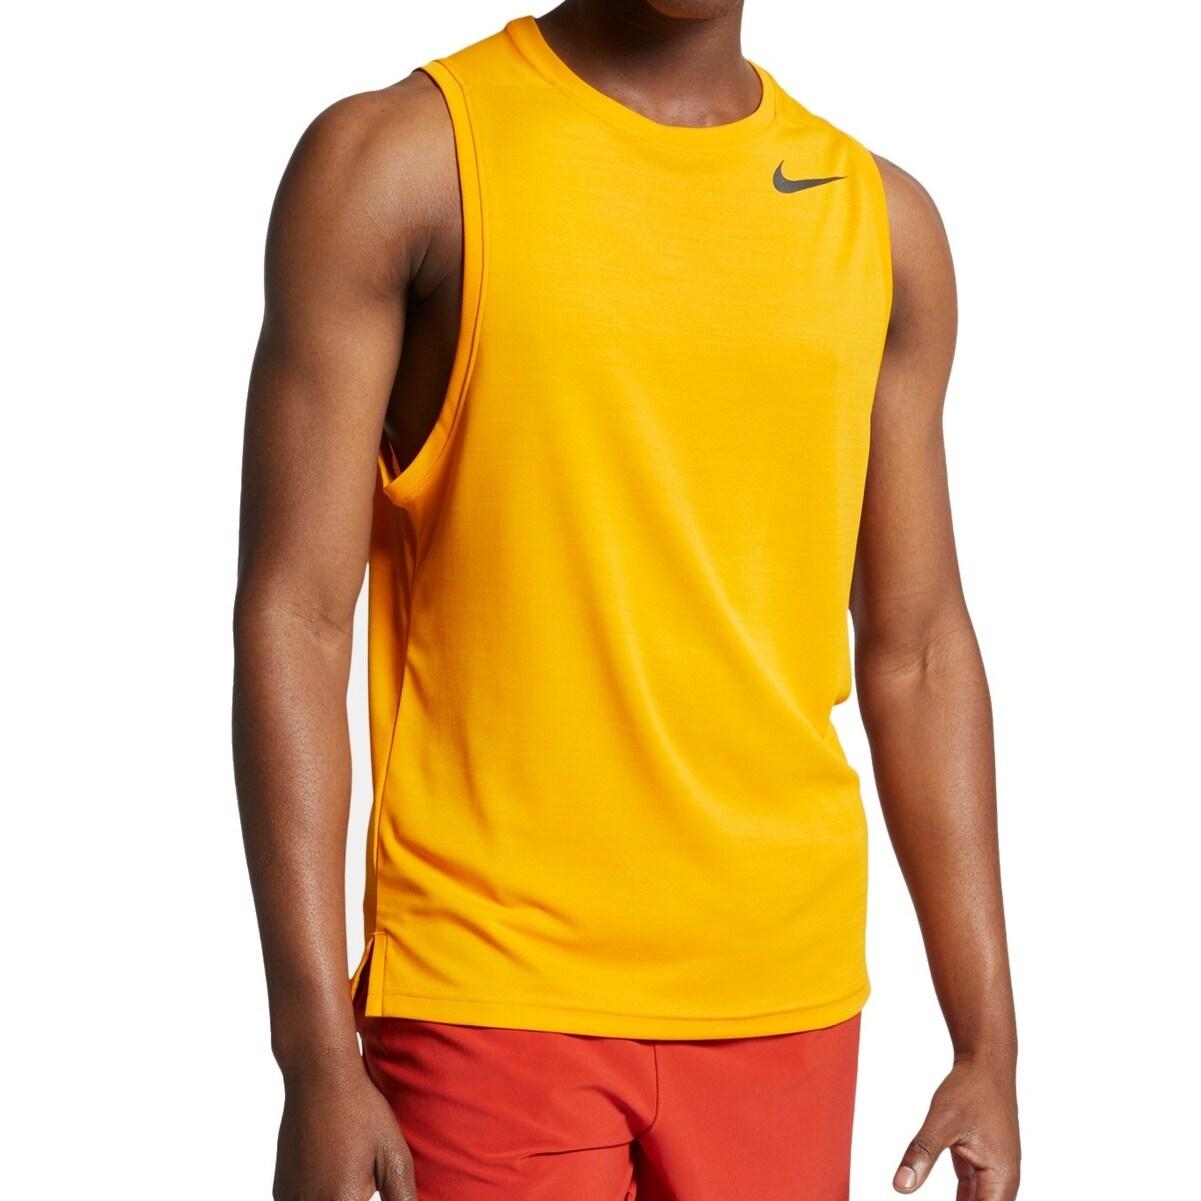 Nike Mens Activewear Top Peel Medium Cotton Dri-Fit Tank